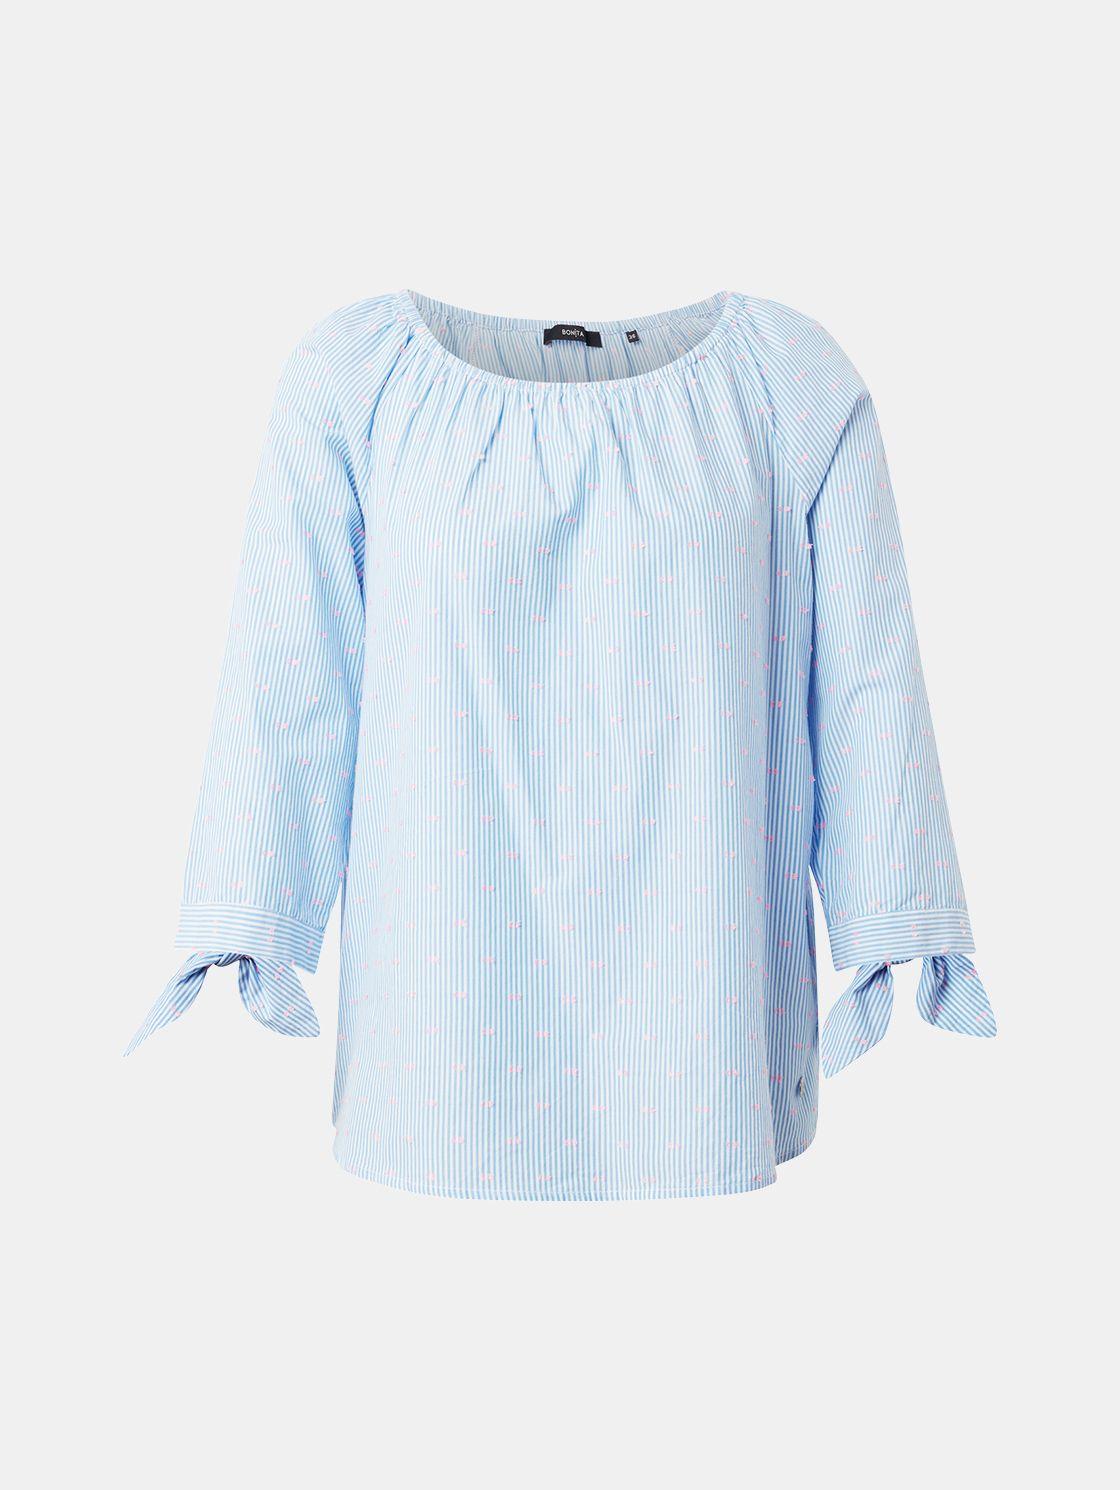 Bonita Damen Shirt mit Streifen 3//4 Arm